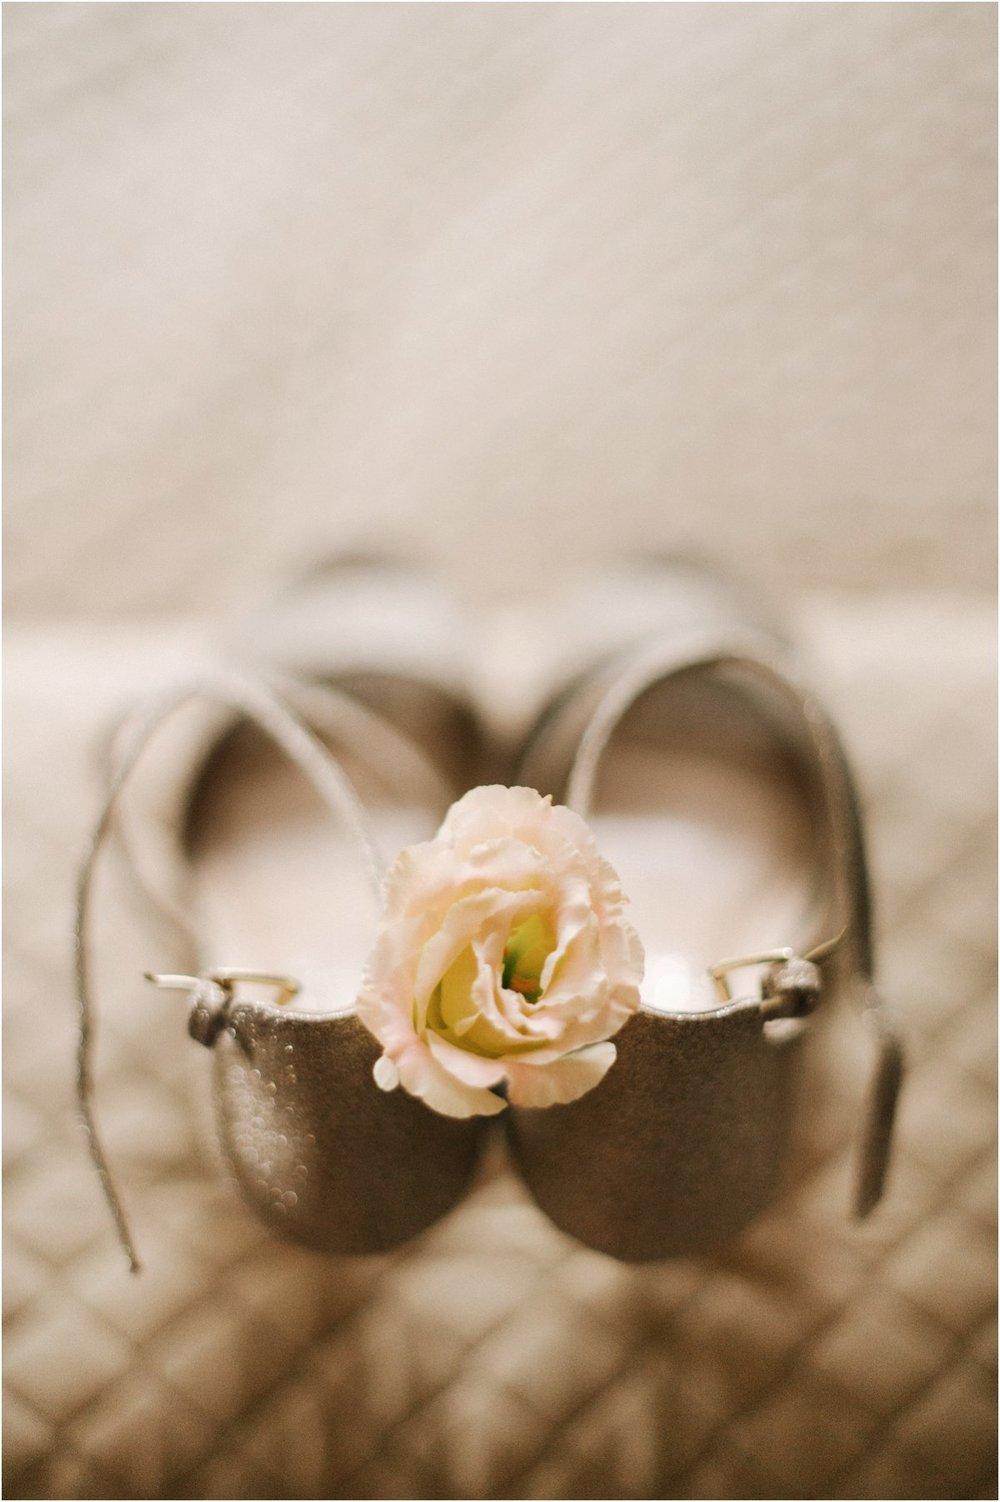 Crofts & Kowalczyk Photography Altskeith House Loch Ard wedding